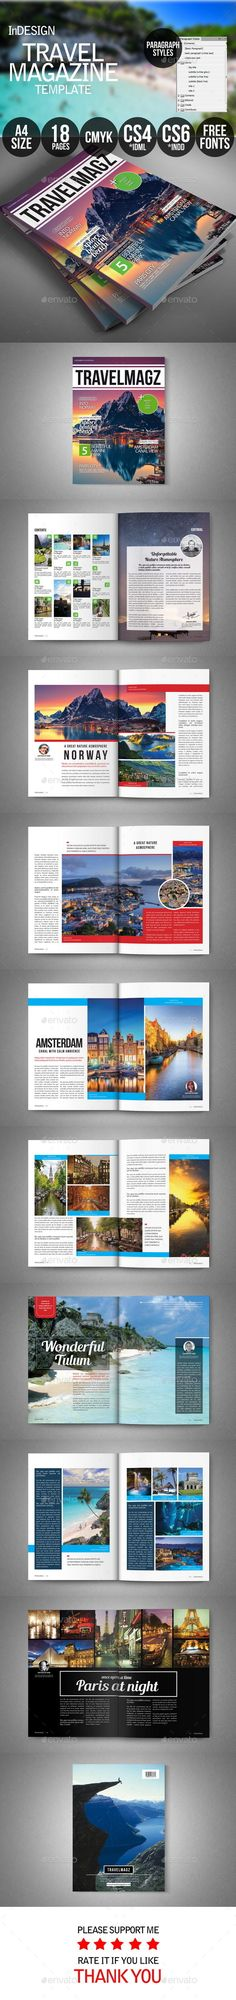 Travel #Magazine - Magazines Print #Templates Download here: https://graphicriver.net/item/travel-magazine/9721353?ref=alena994